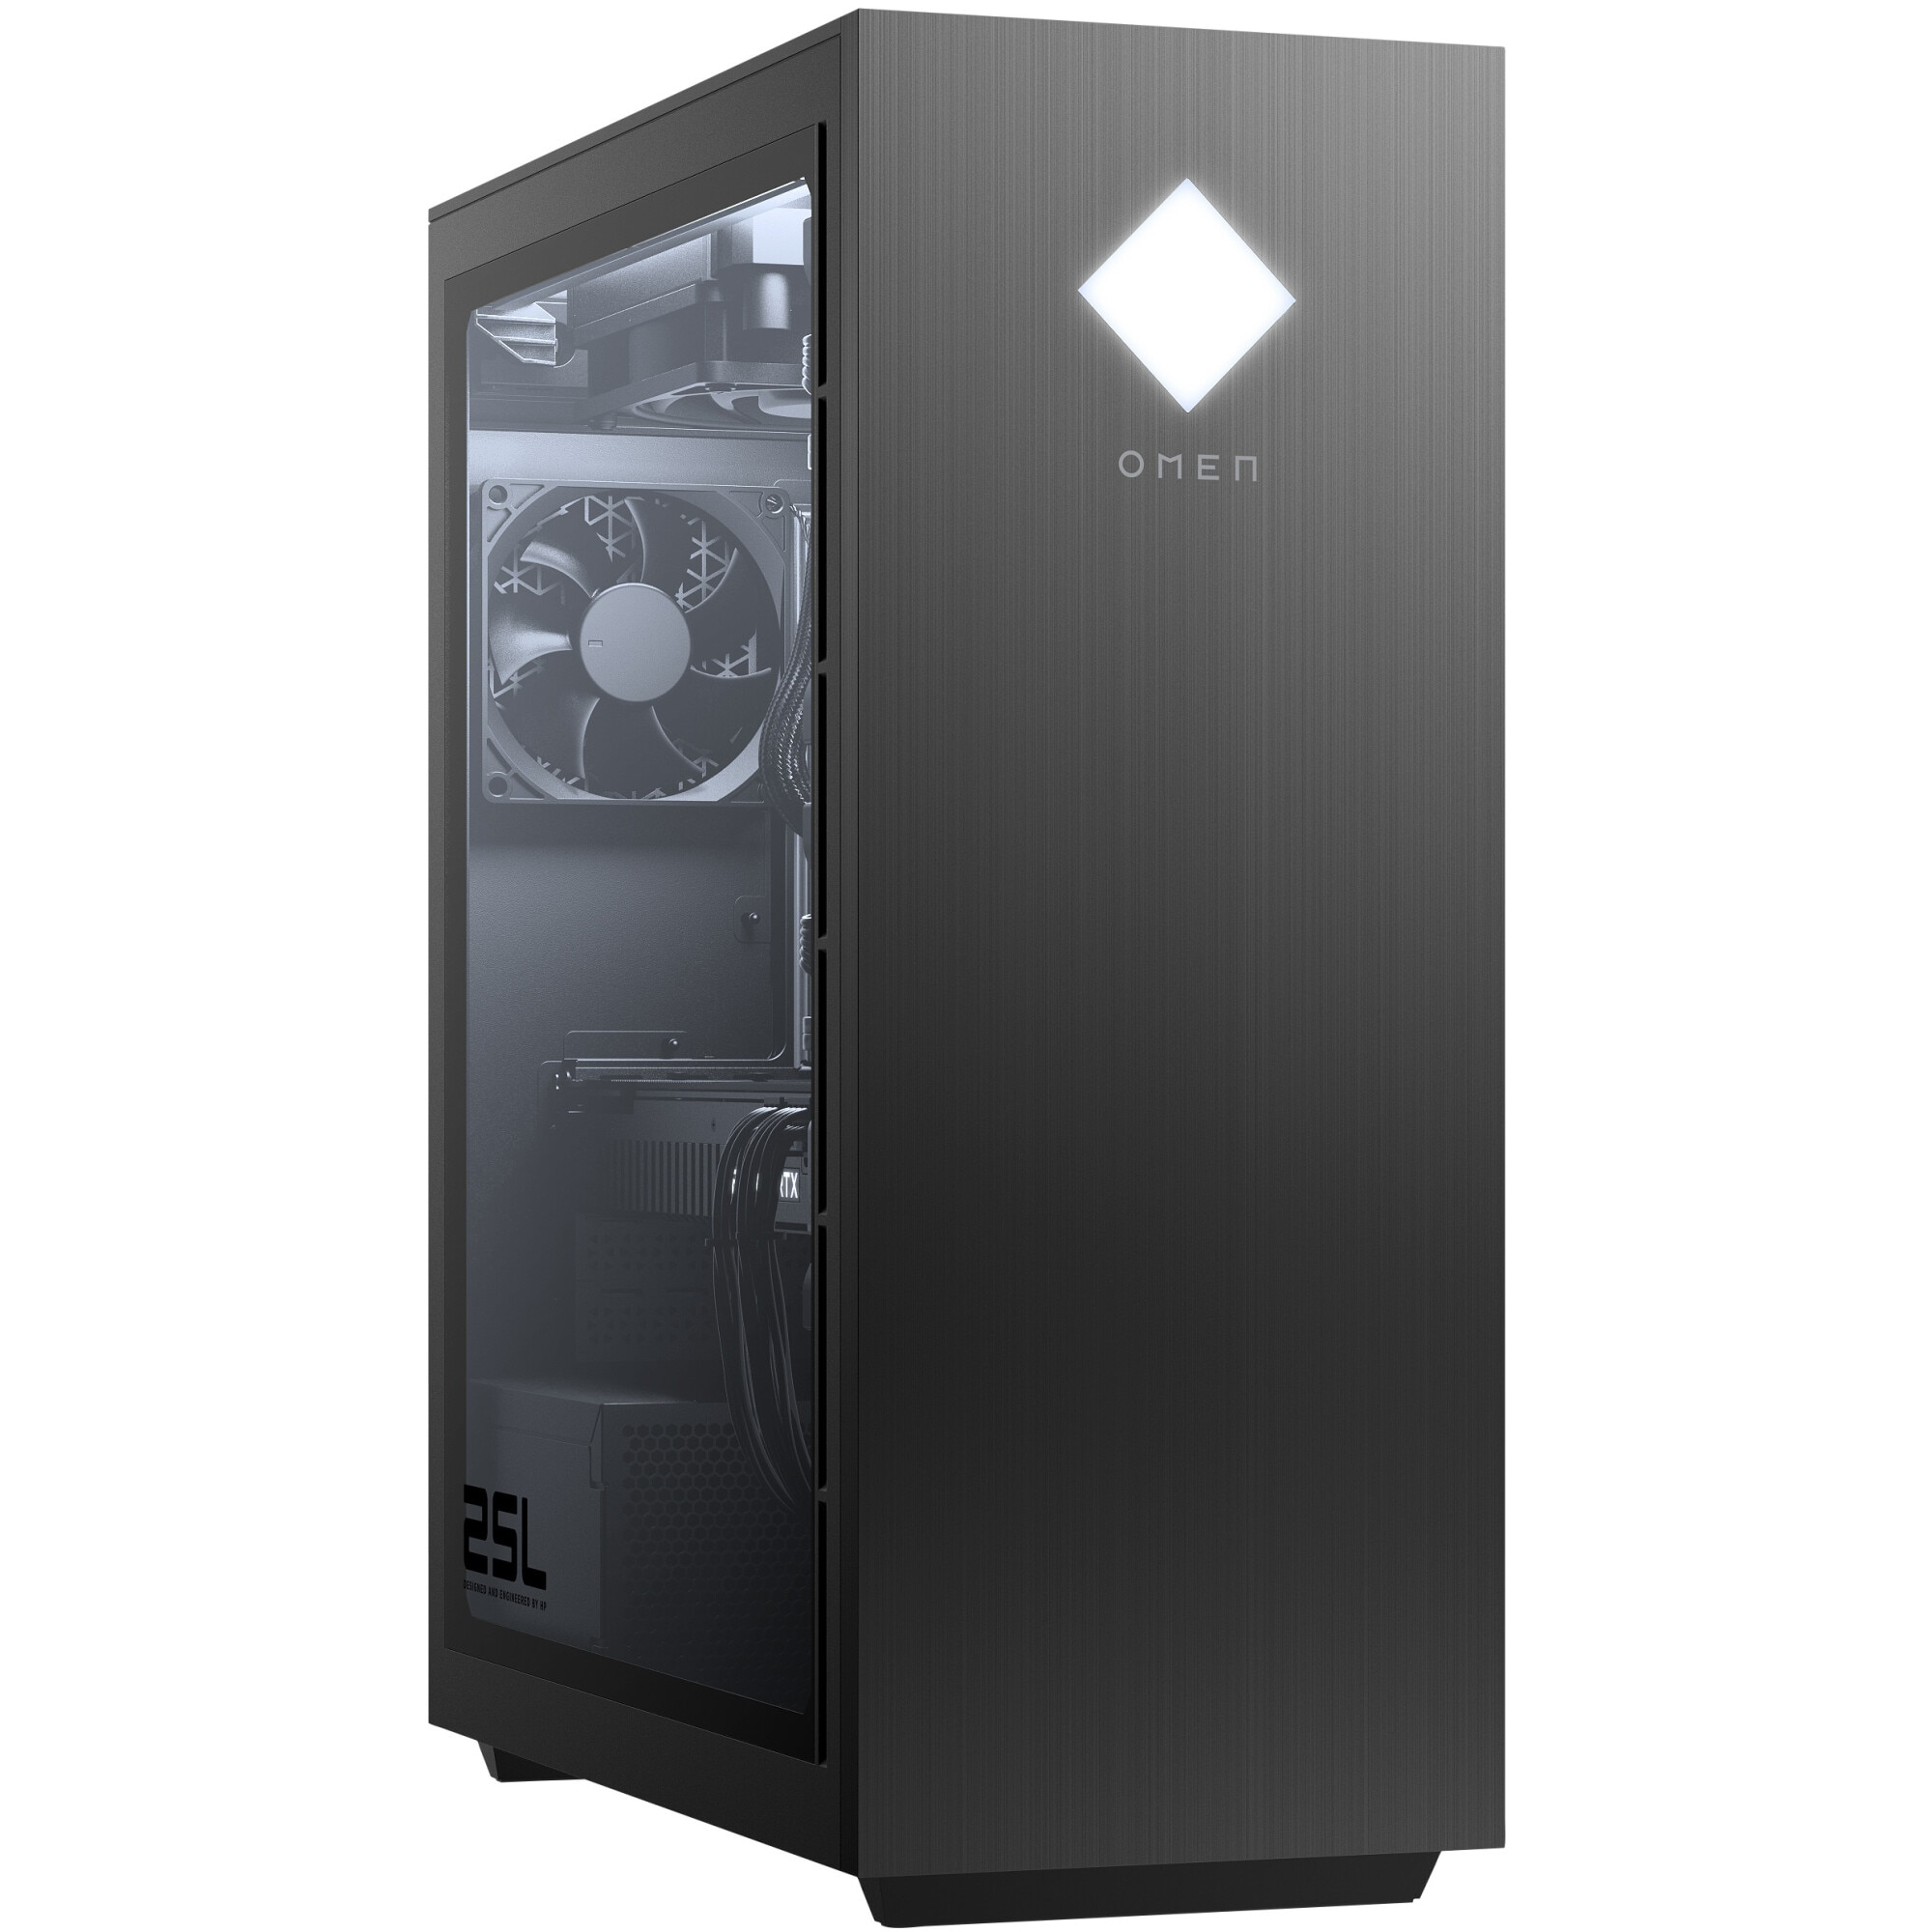 Fotografie Sistem Gaming OMEN by HP GT12-1000nq cu procesor AMD Ryzen™ 5 5600G pana la 4.40 GHz, 16GB DDR4, 512GB SSD, NVIDIA GeForce RTX 3060 12GB, Free DOS, Black